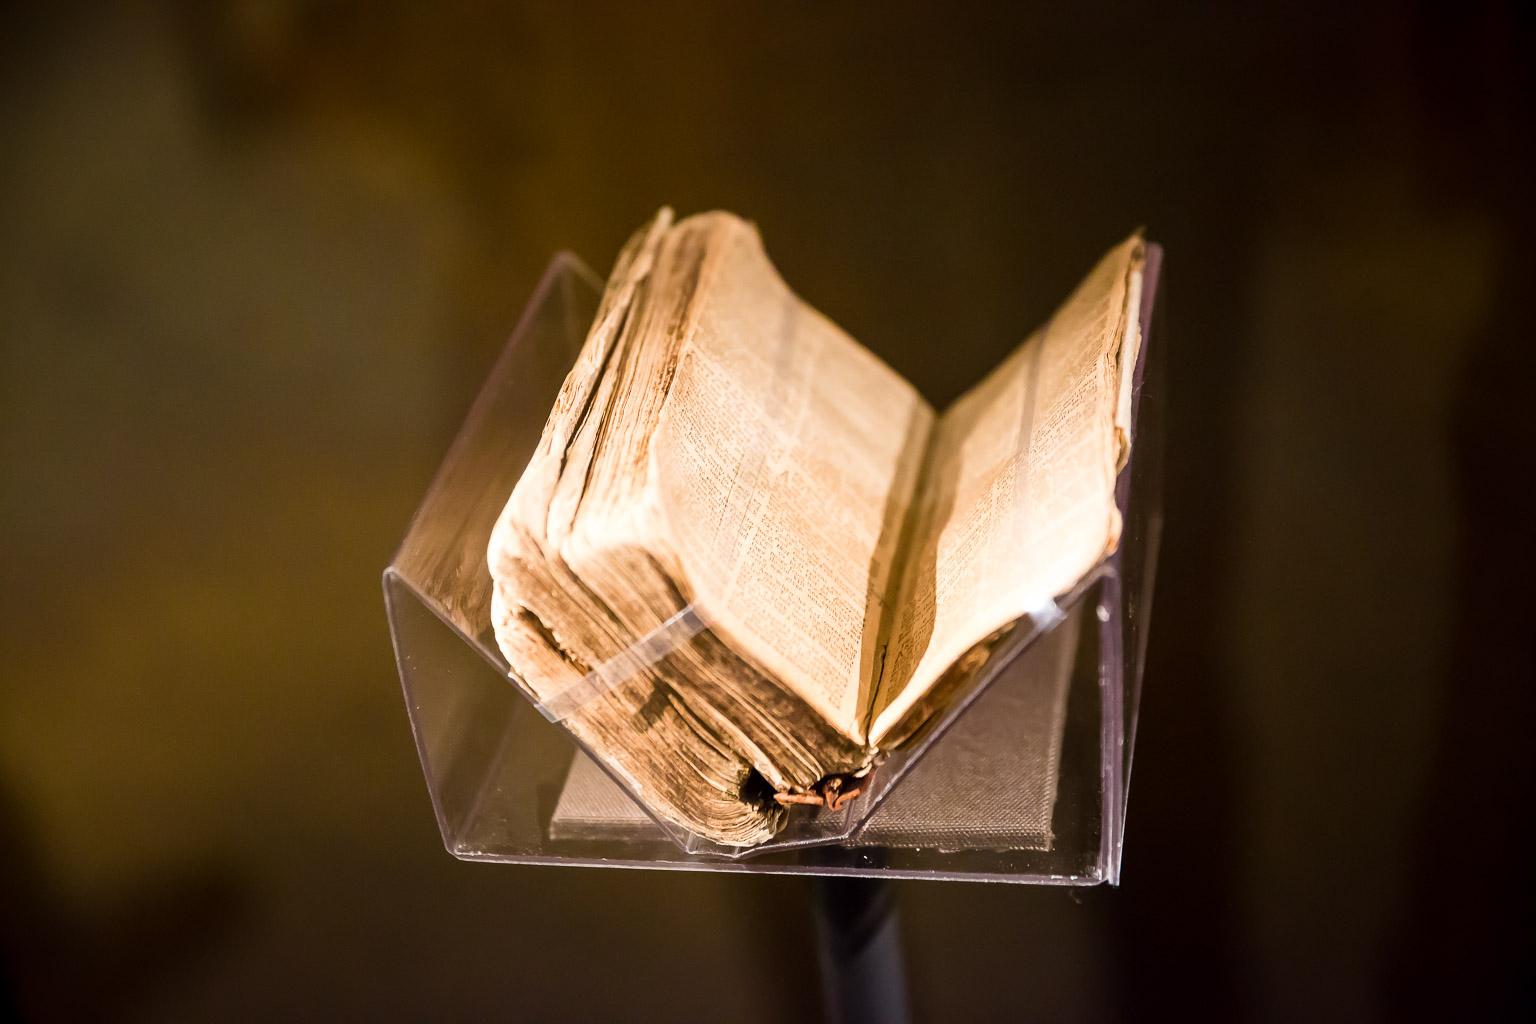 Nat Turner's bible.